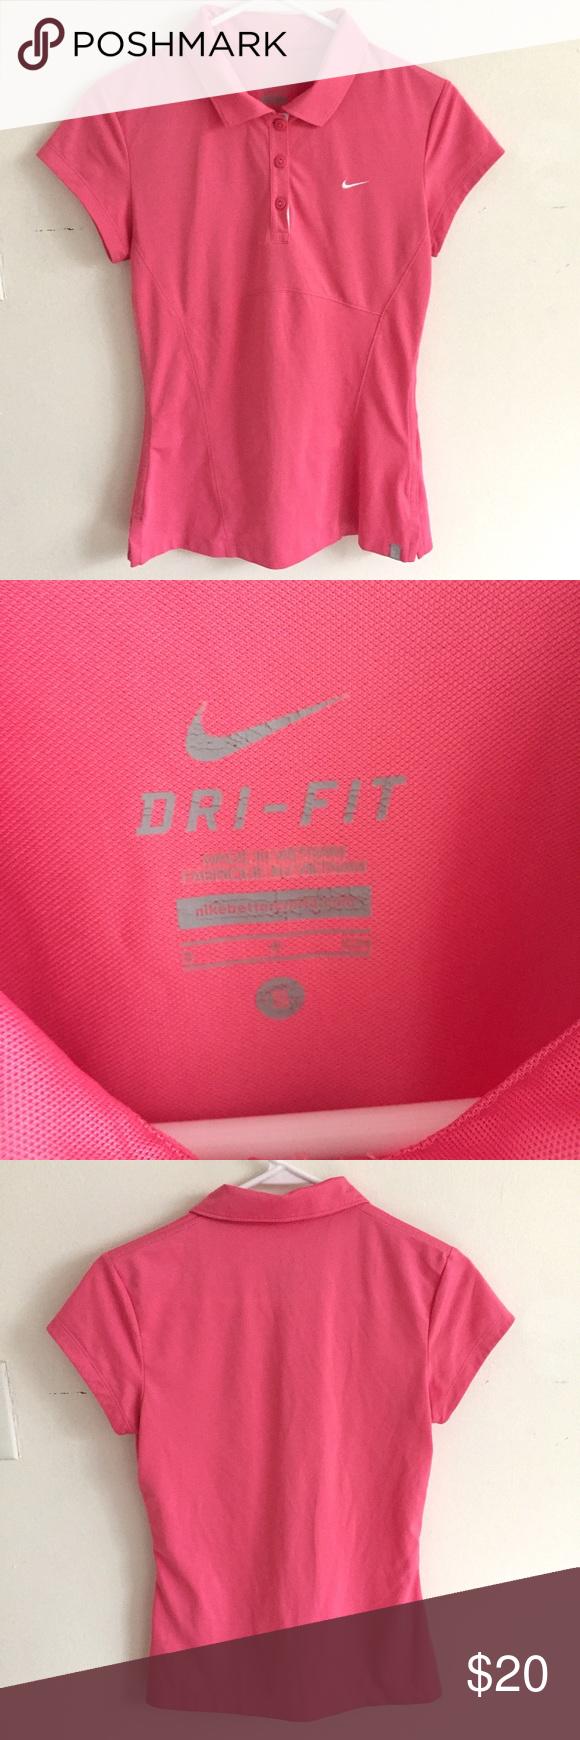 Nike dri fit pink polo size small Nike dri fit pink polo size small Nike Tops